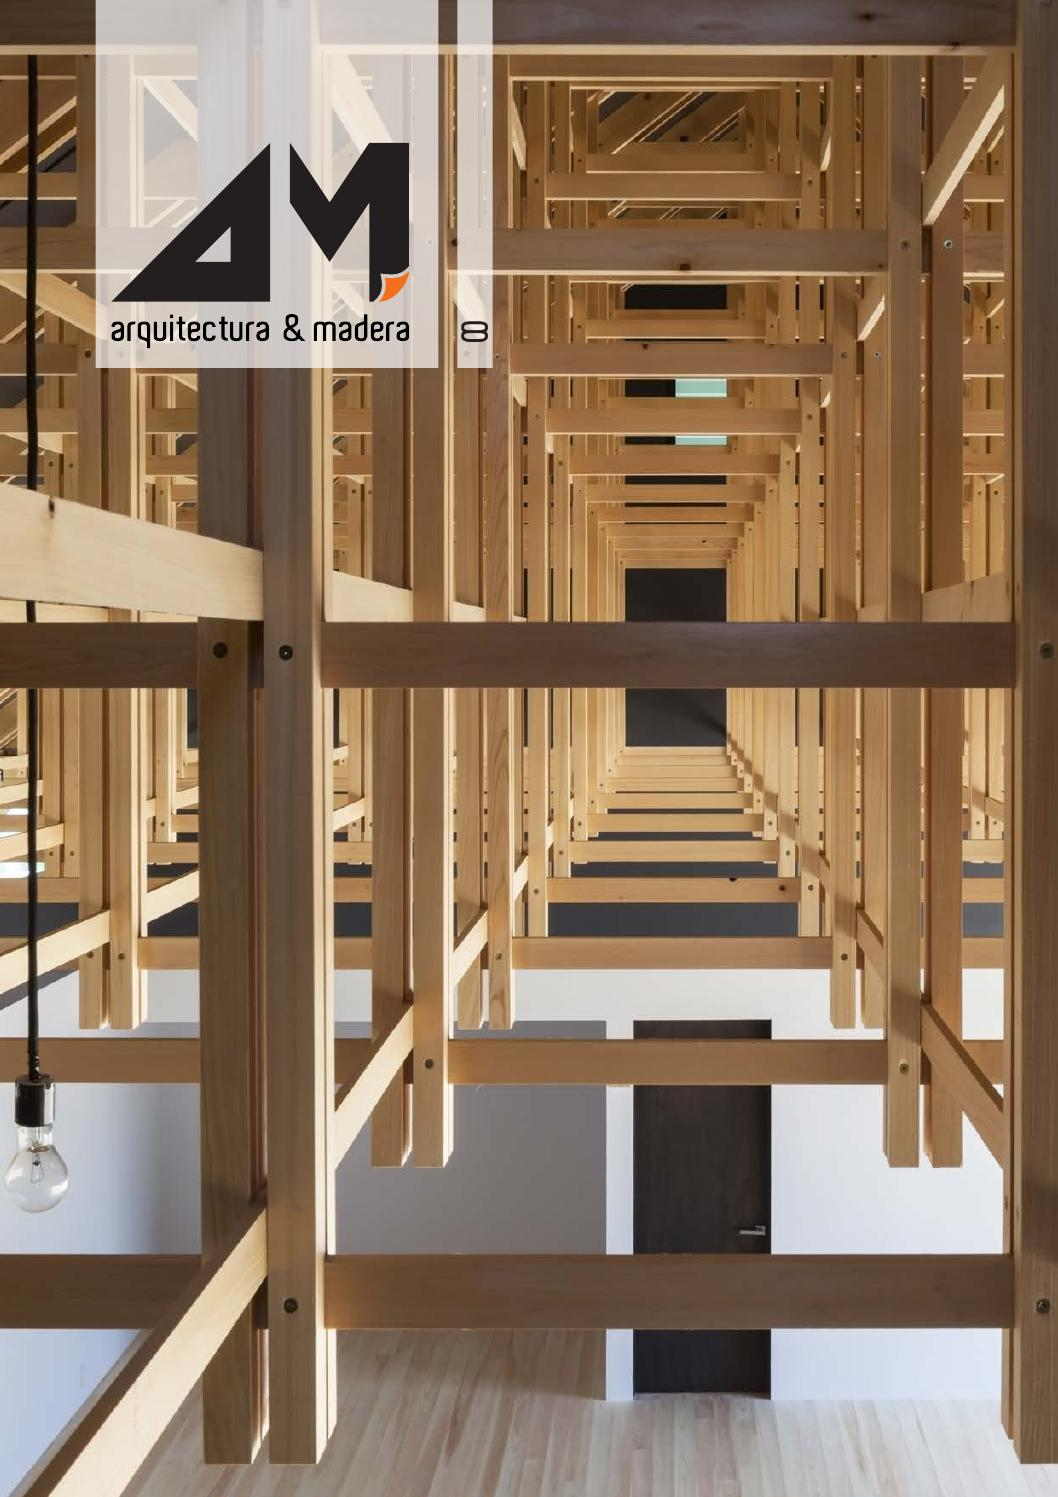 Arquitectura y madera 08 by publiditec issuu for Arquitectura de madera